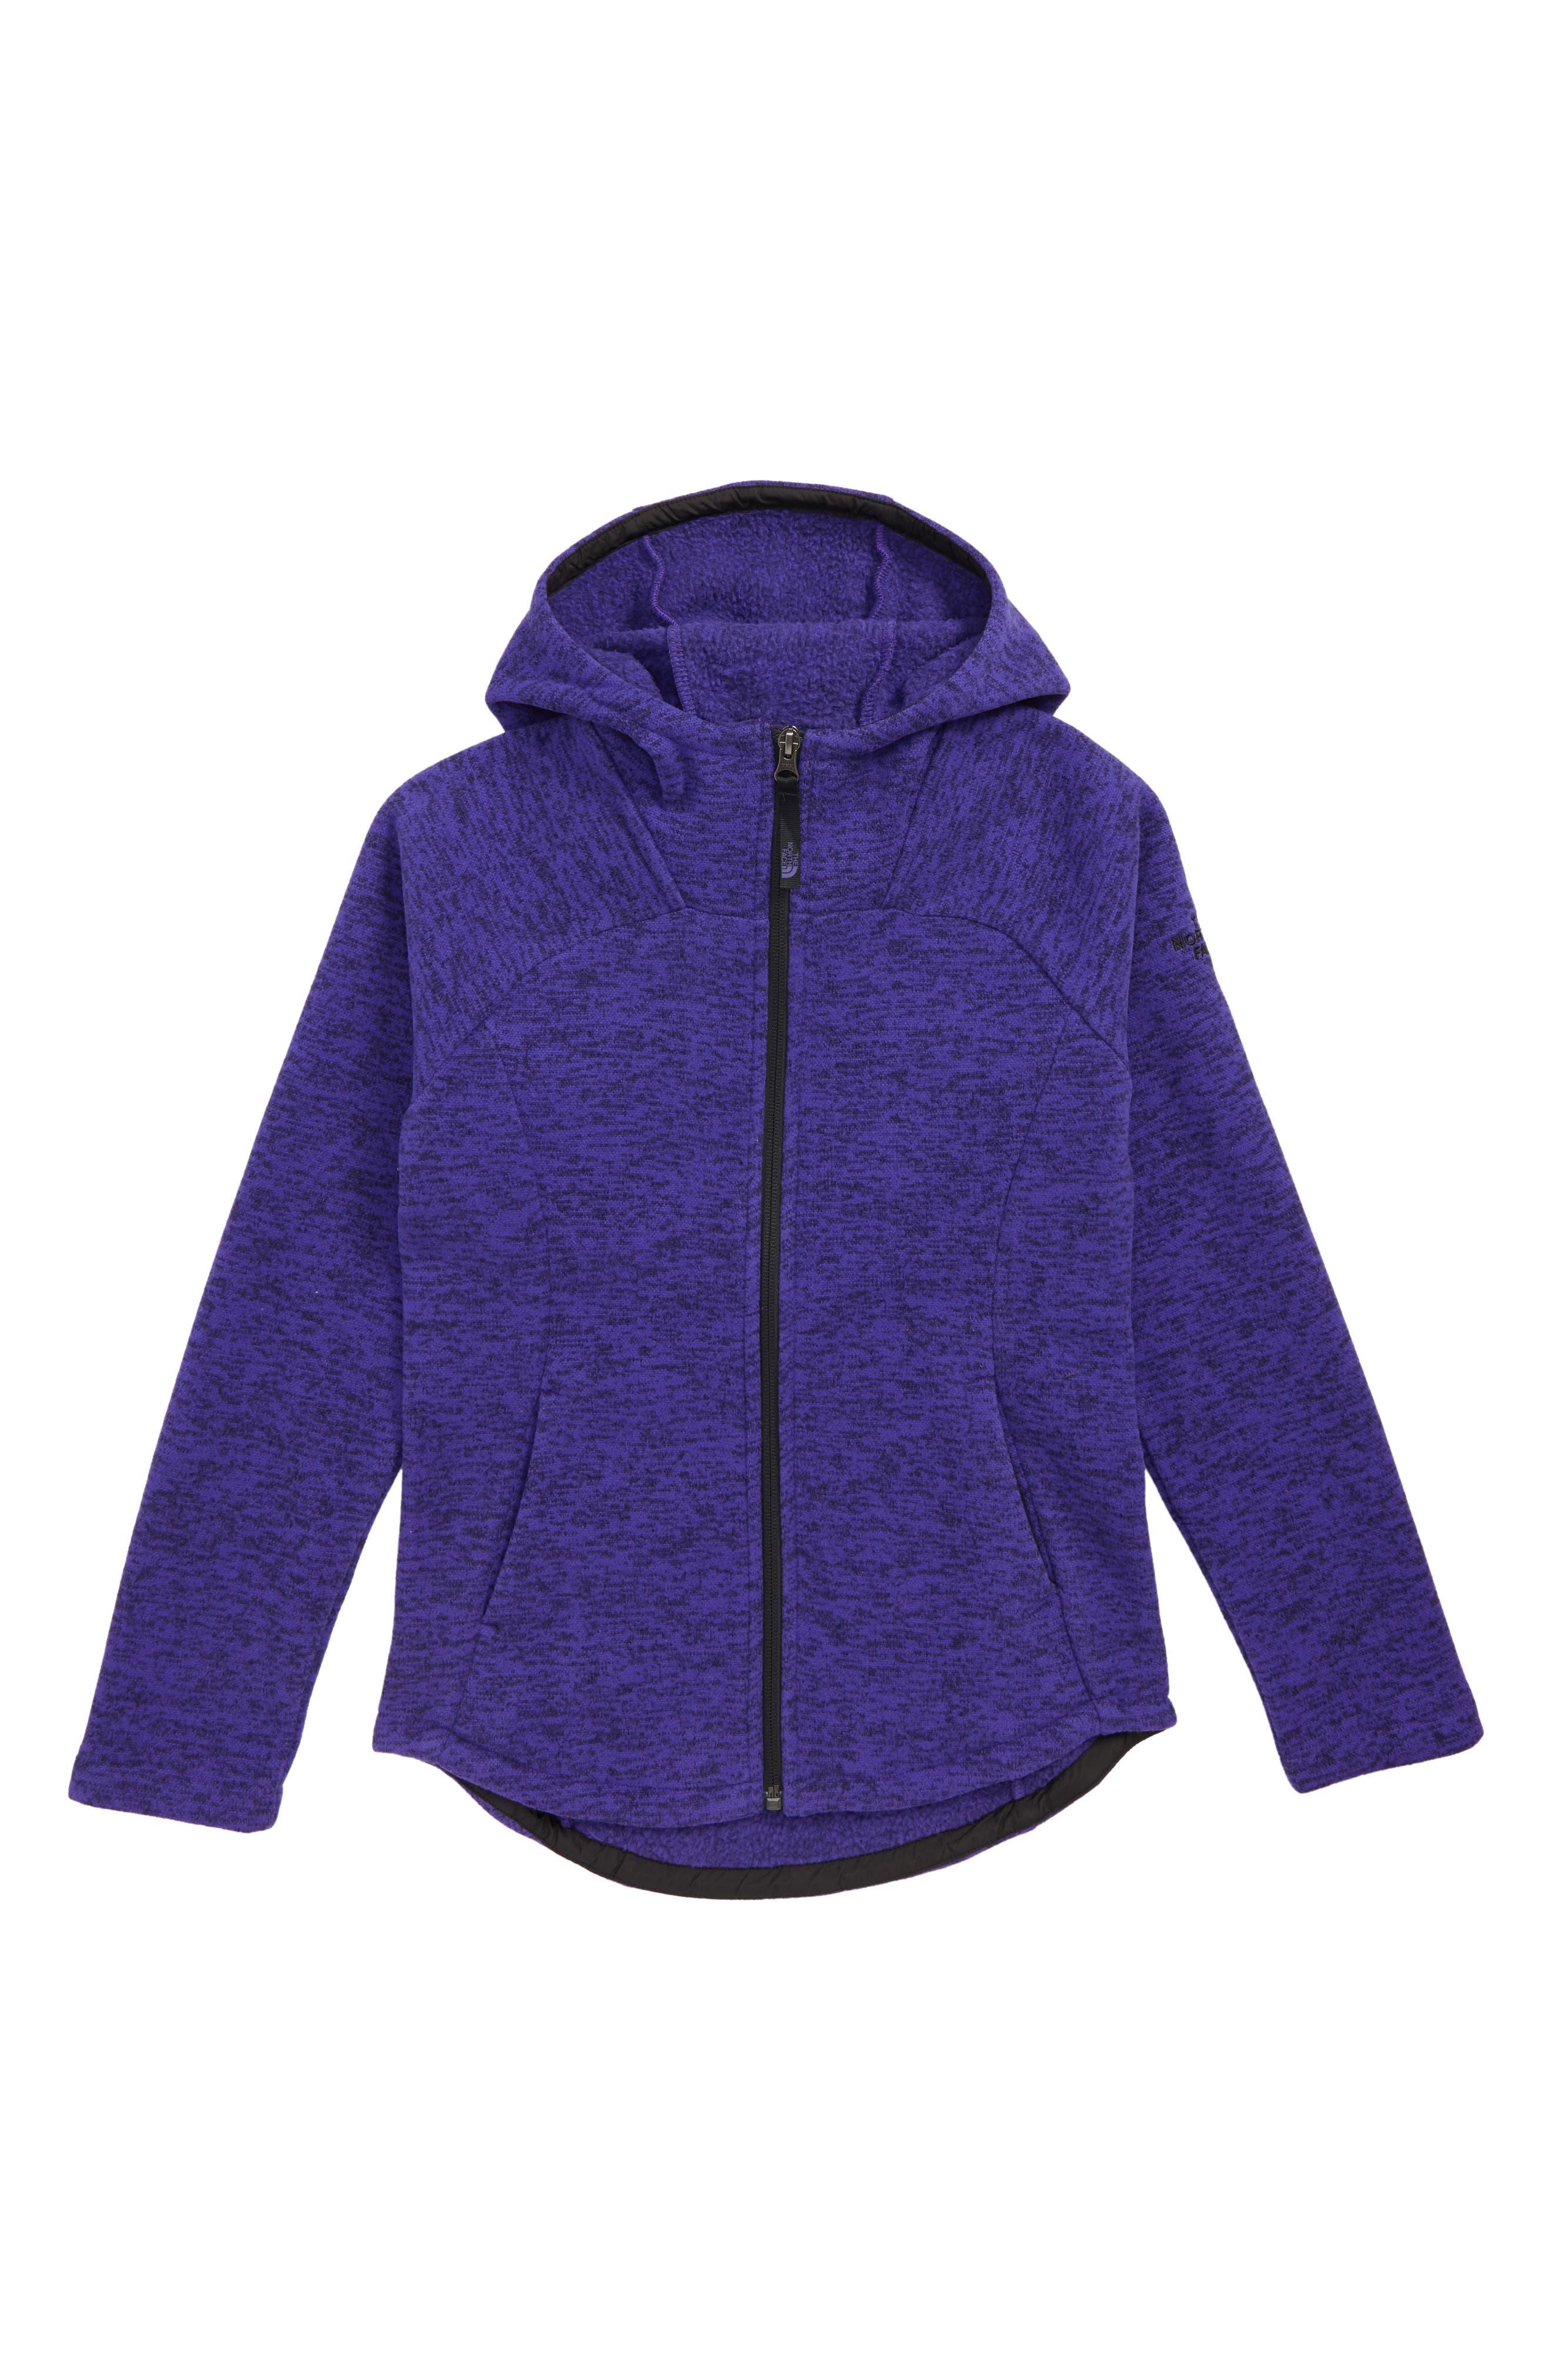 Indi Fleece Jacket,                             Main thumbnail 1, color,                             DEEP BLUE HEATHER